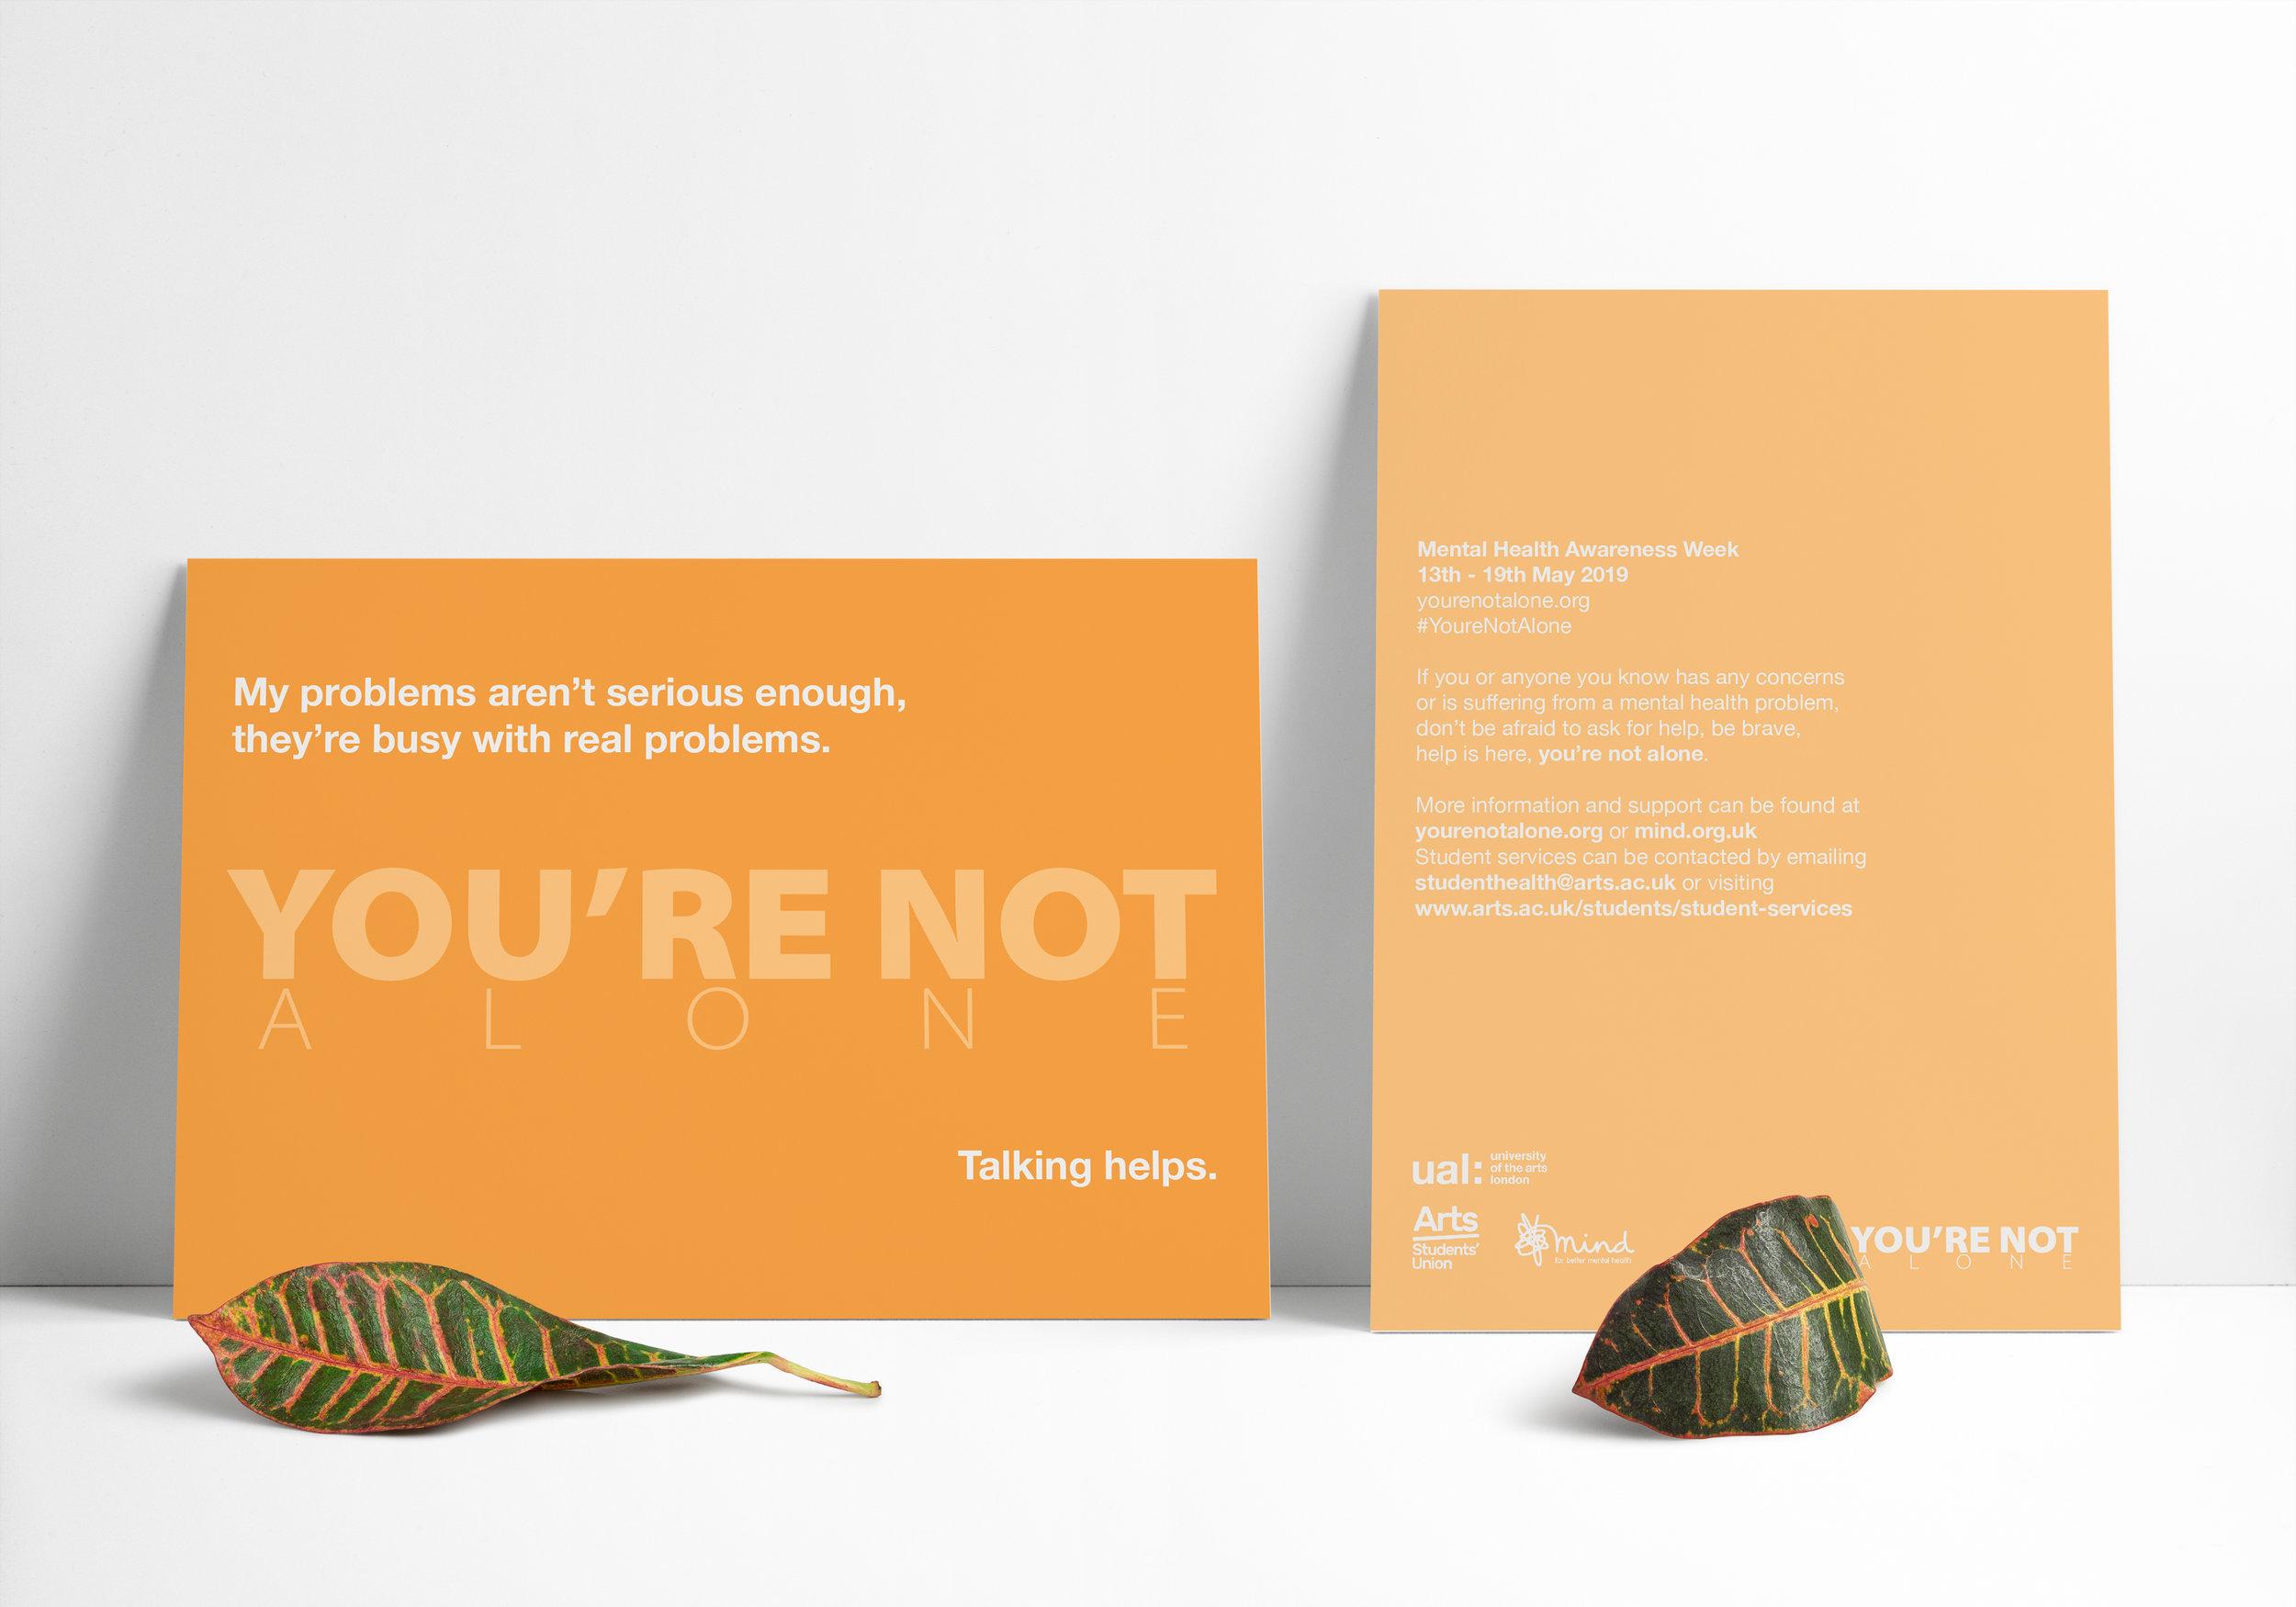 #You'reNotAlone -